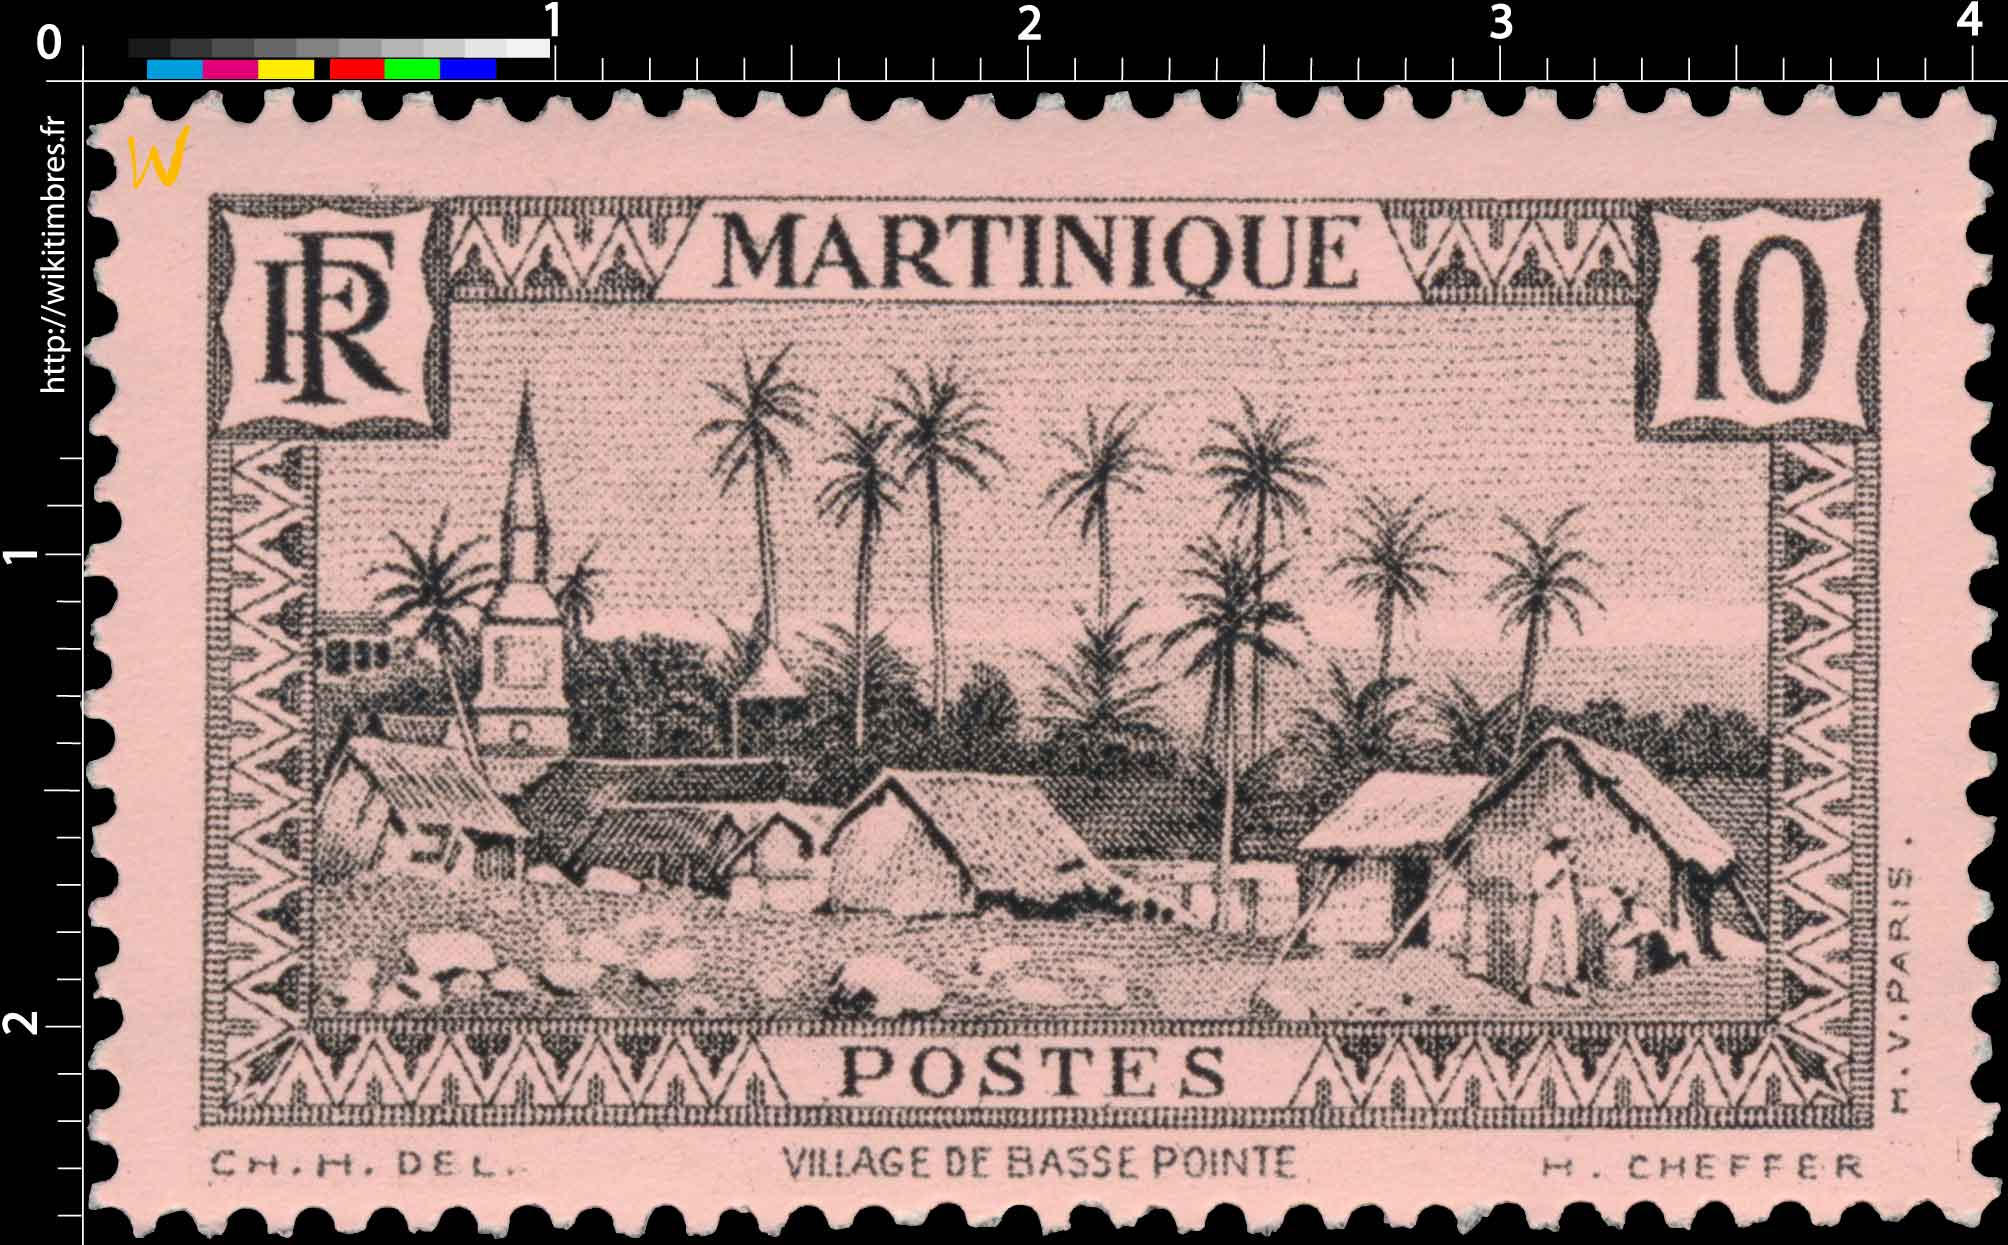 MARTINIQUE  Village de Basse-Pointe